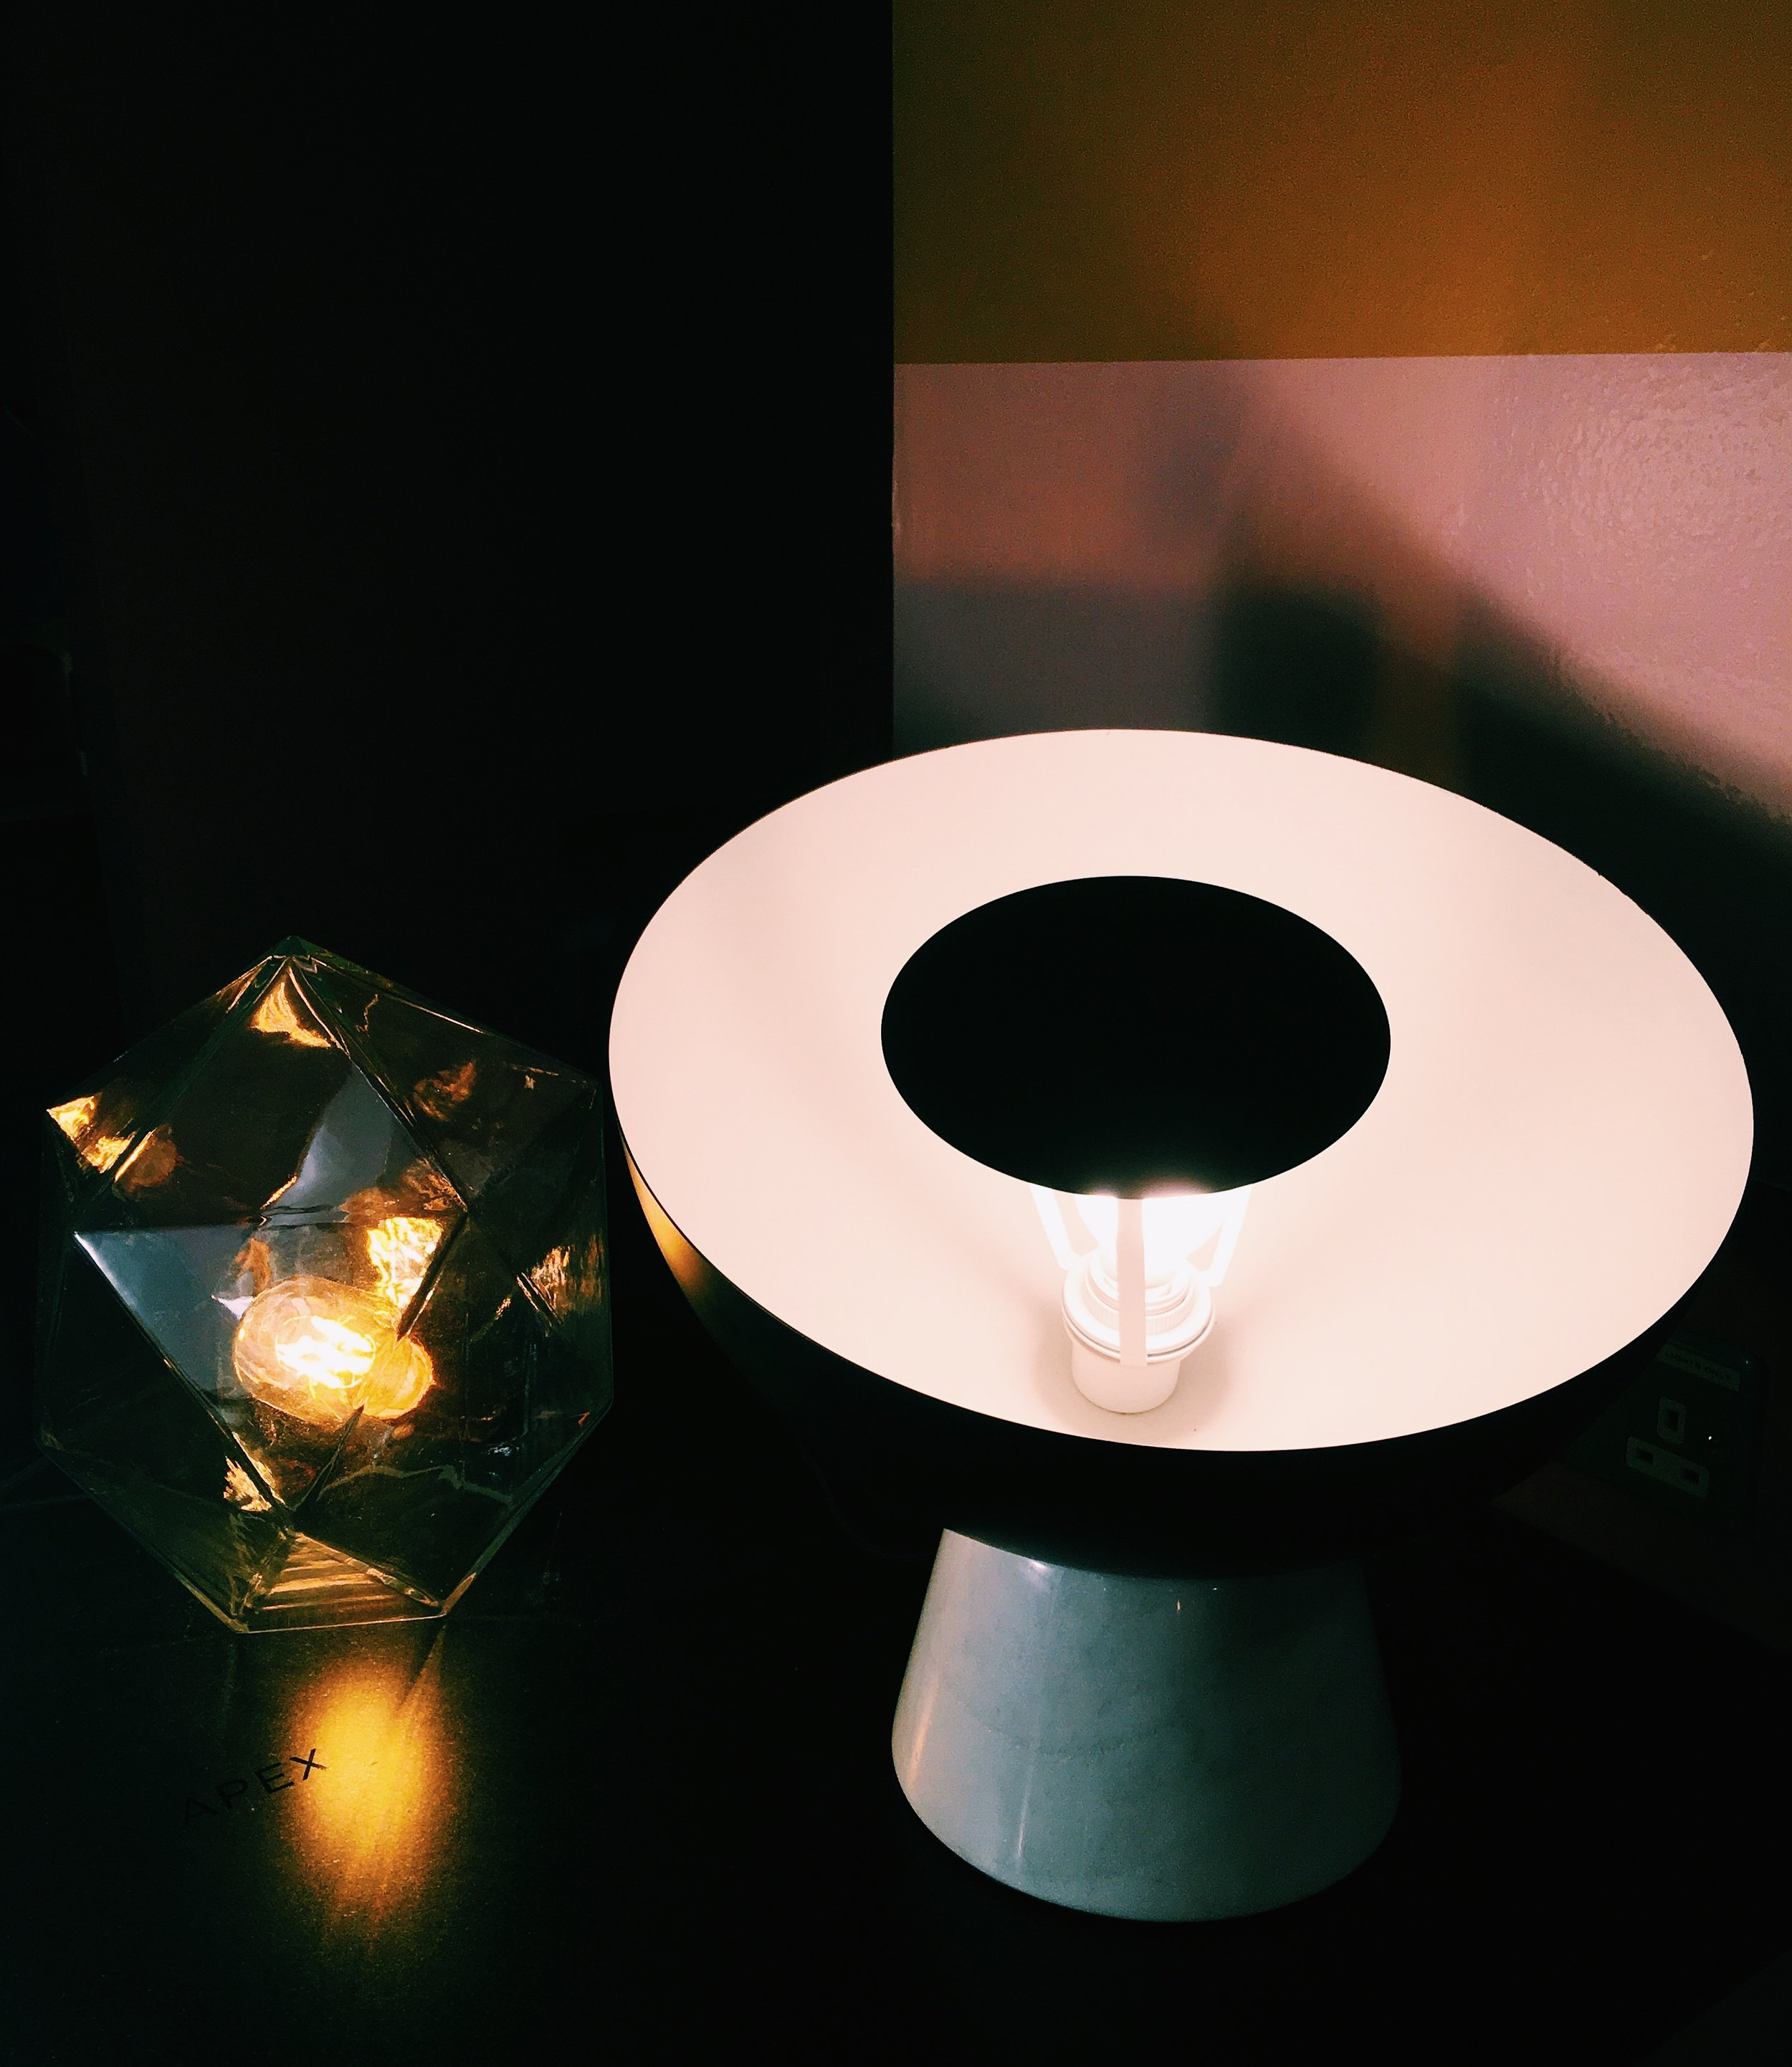 Apex lamp, £60. Shelby half sphere lamp, £130